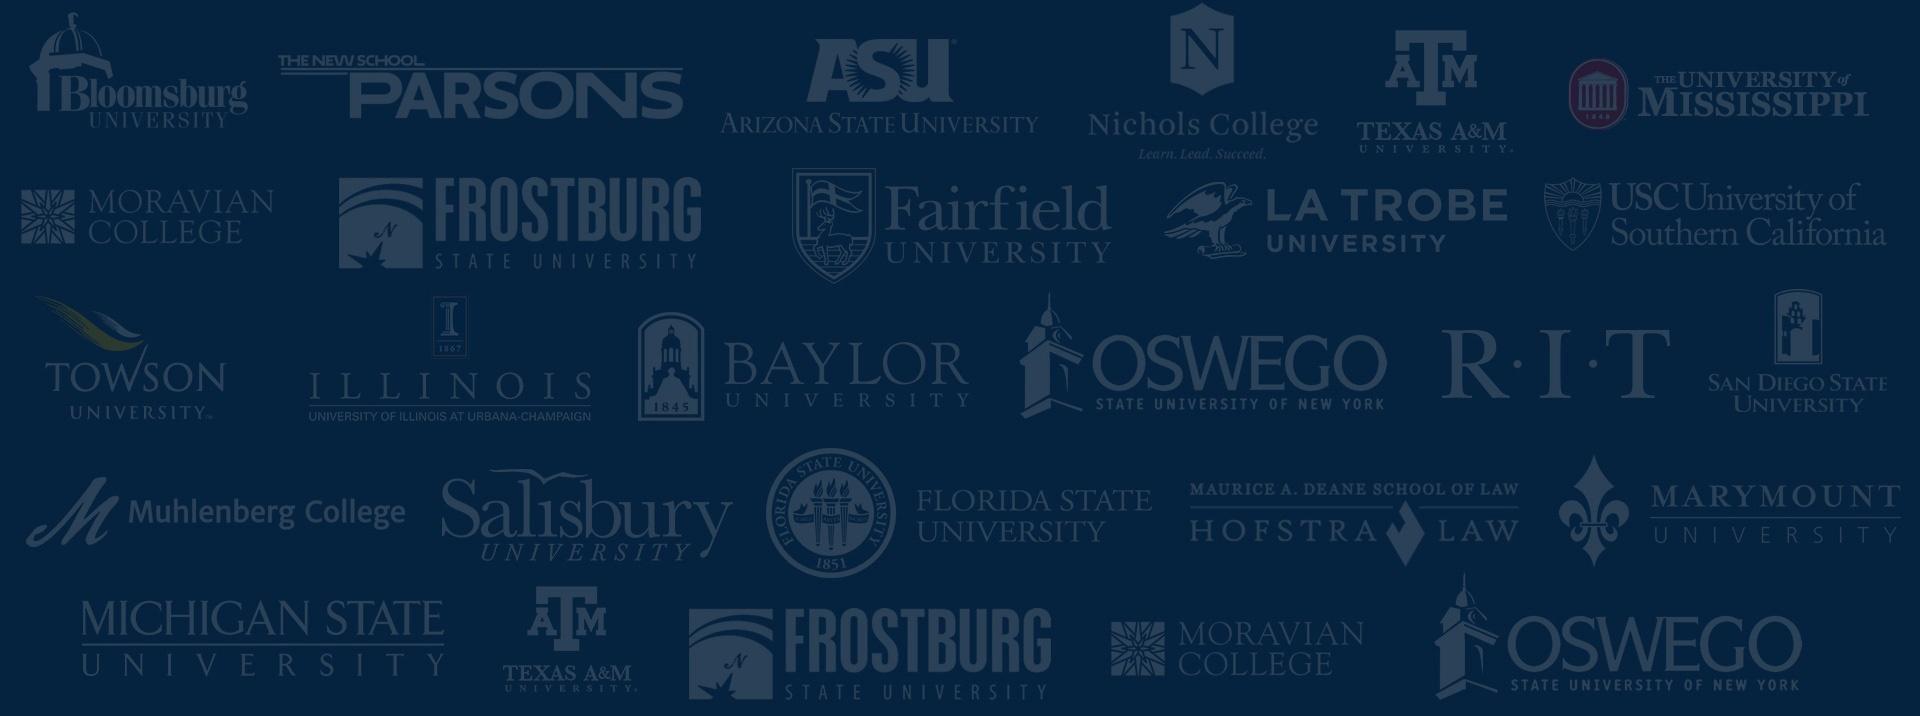 university-partnerships-1.jpg